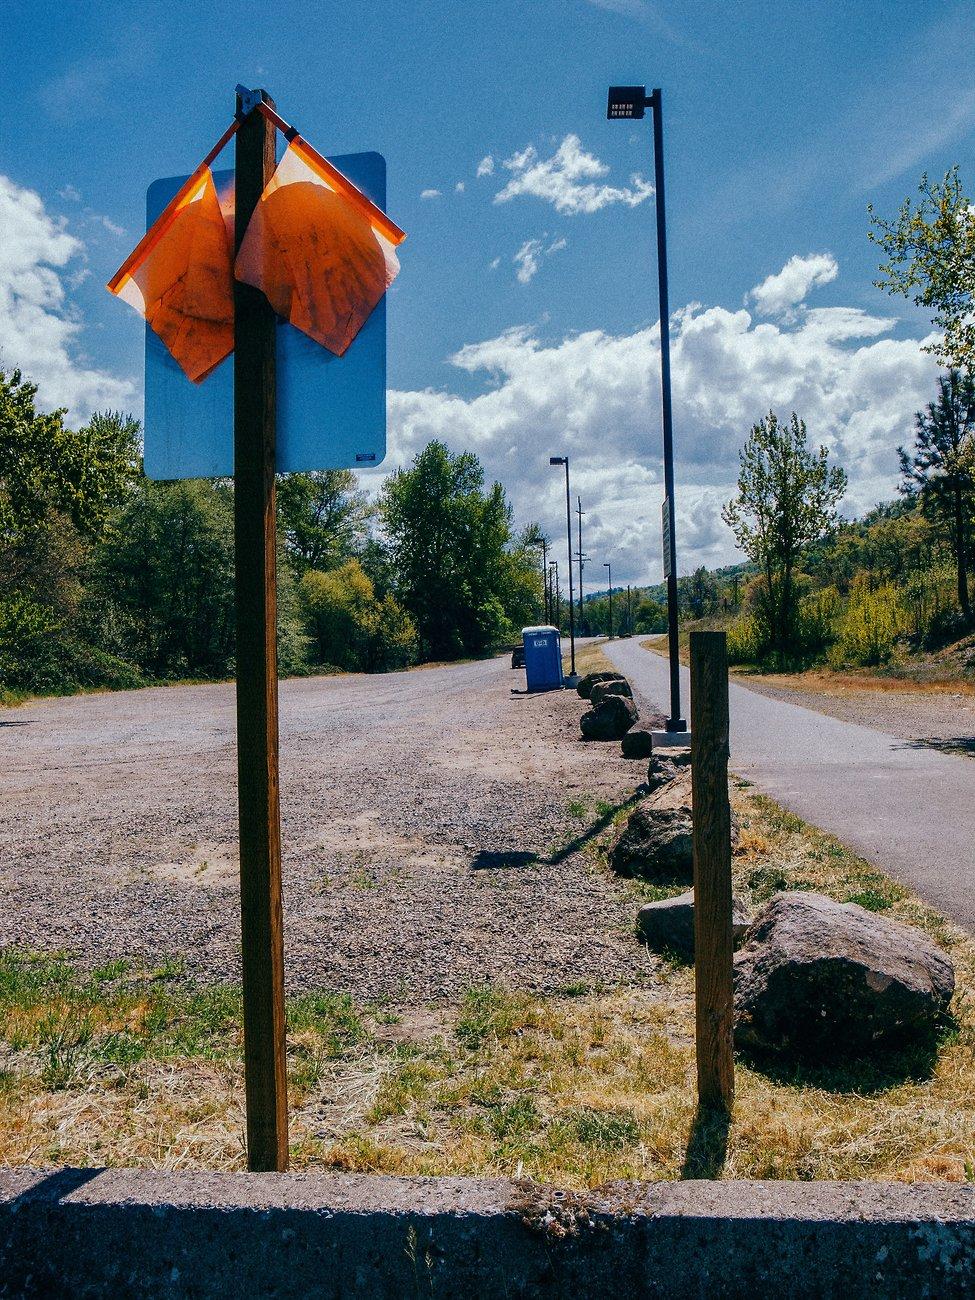 GRD_Bike_path_parking_lot.jpg